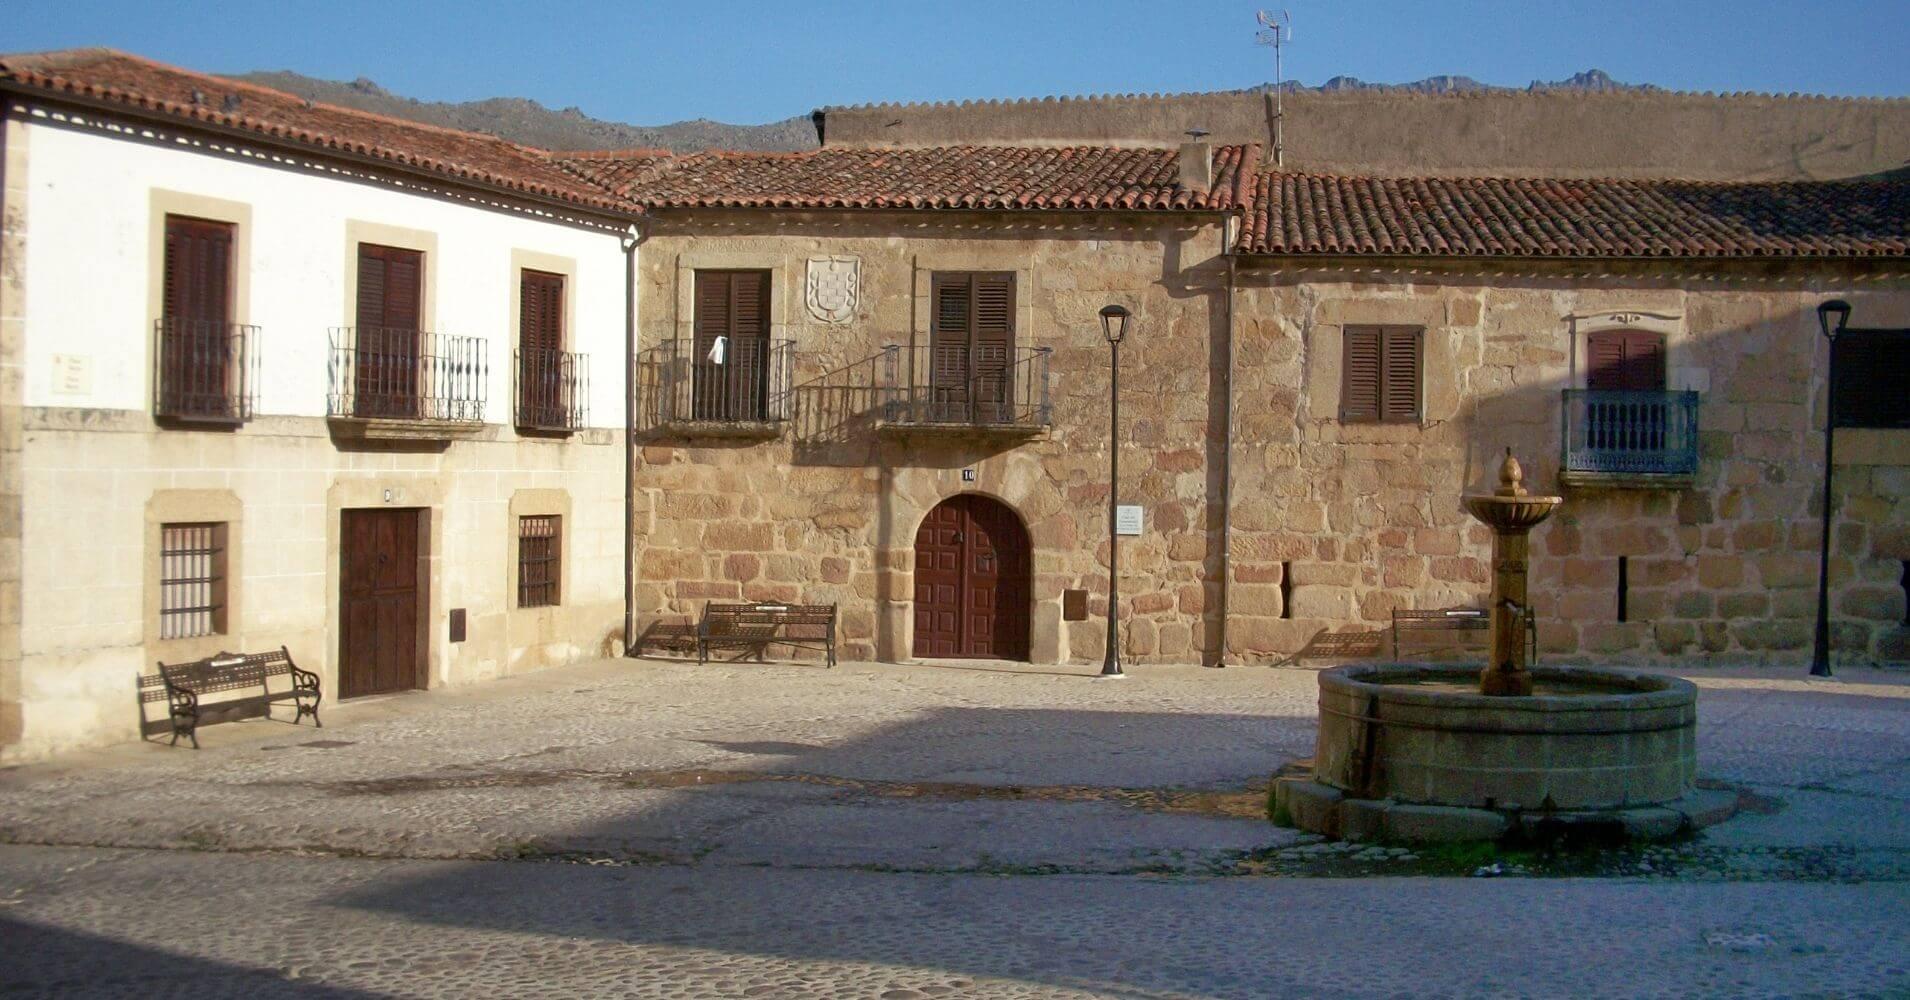 En San Martín de Trevejo, Sierra de Gata. Cáceres. Extremadura.